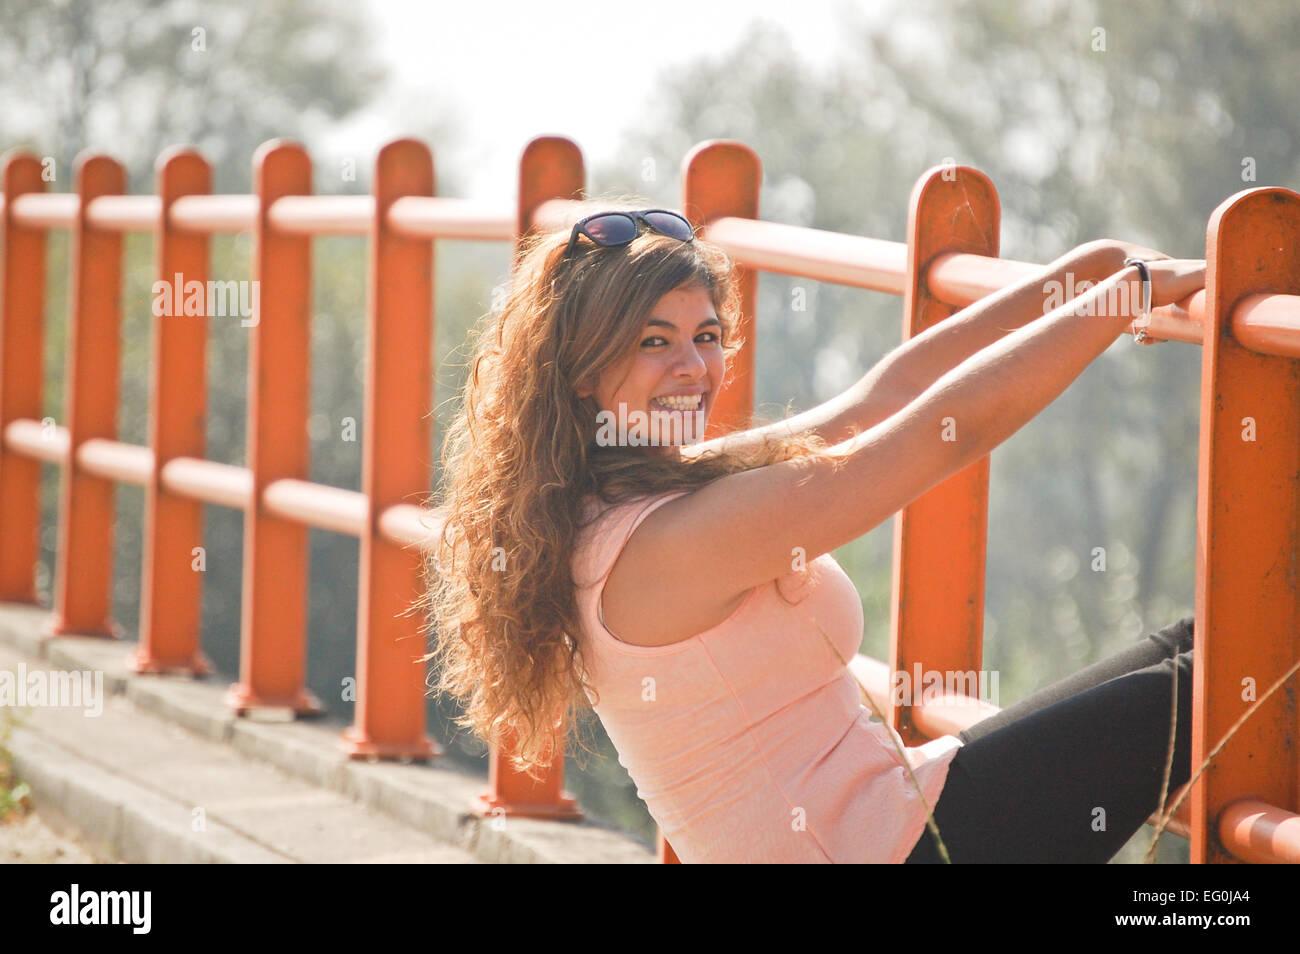 Long haired woman leaning on barrière orange et souriant à l'appareil photo Photo Stock